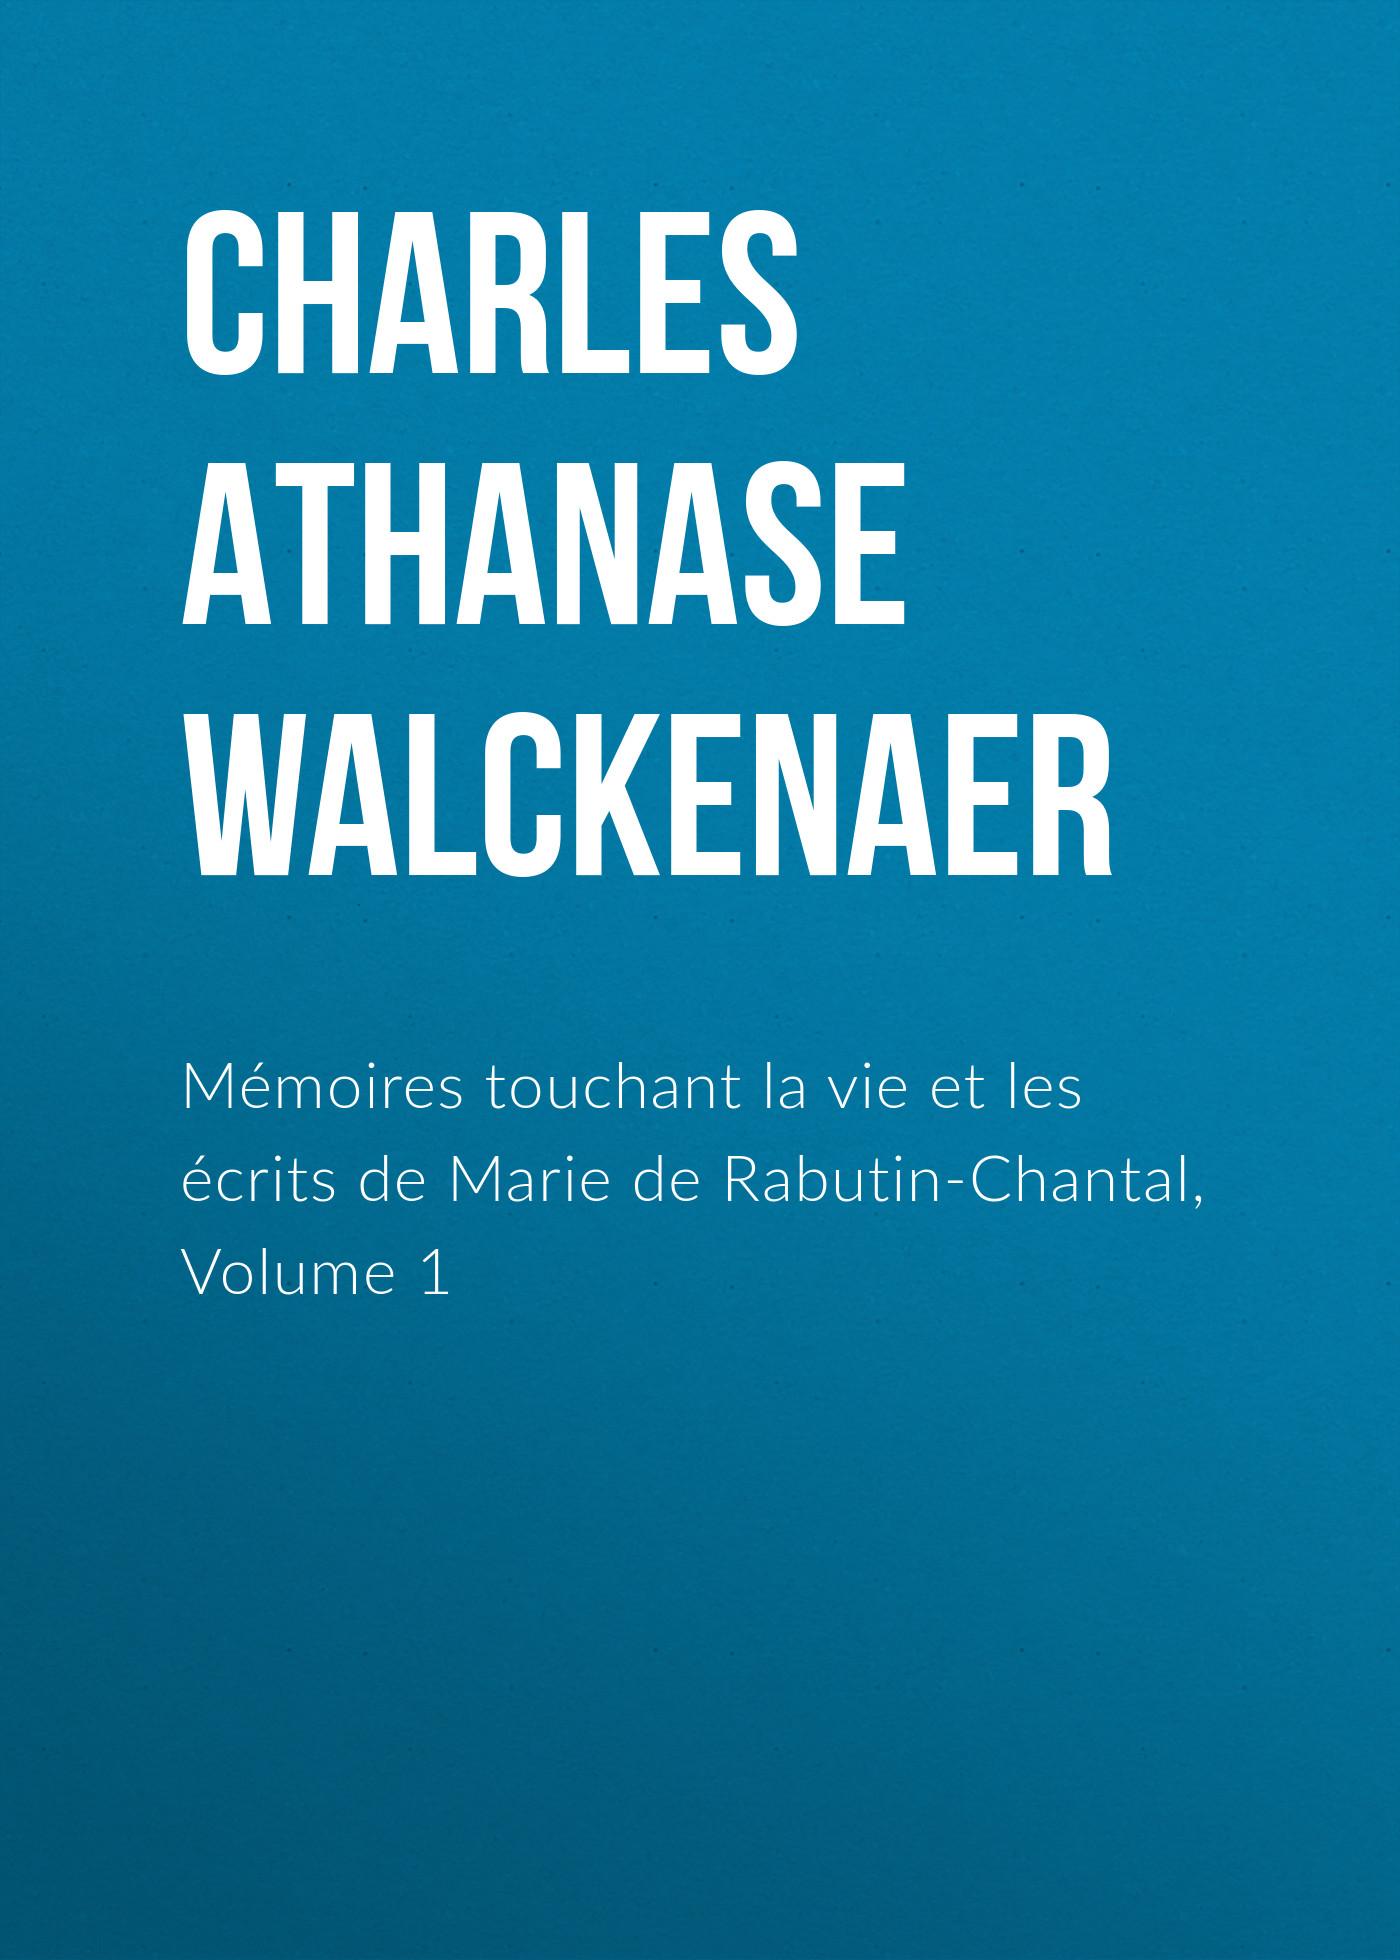 Charles Athanase Walckenaer Mémoires touchant la vie et les écrits de Marie de Rabutin-Chantal, Volume 1 benedictus de spinoza uvres de spinoza volume 1